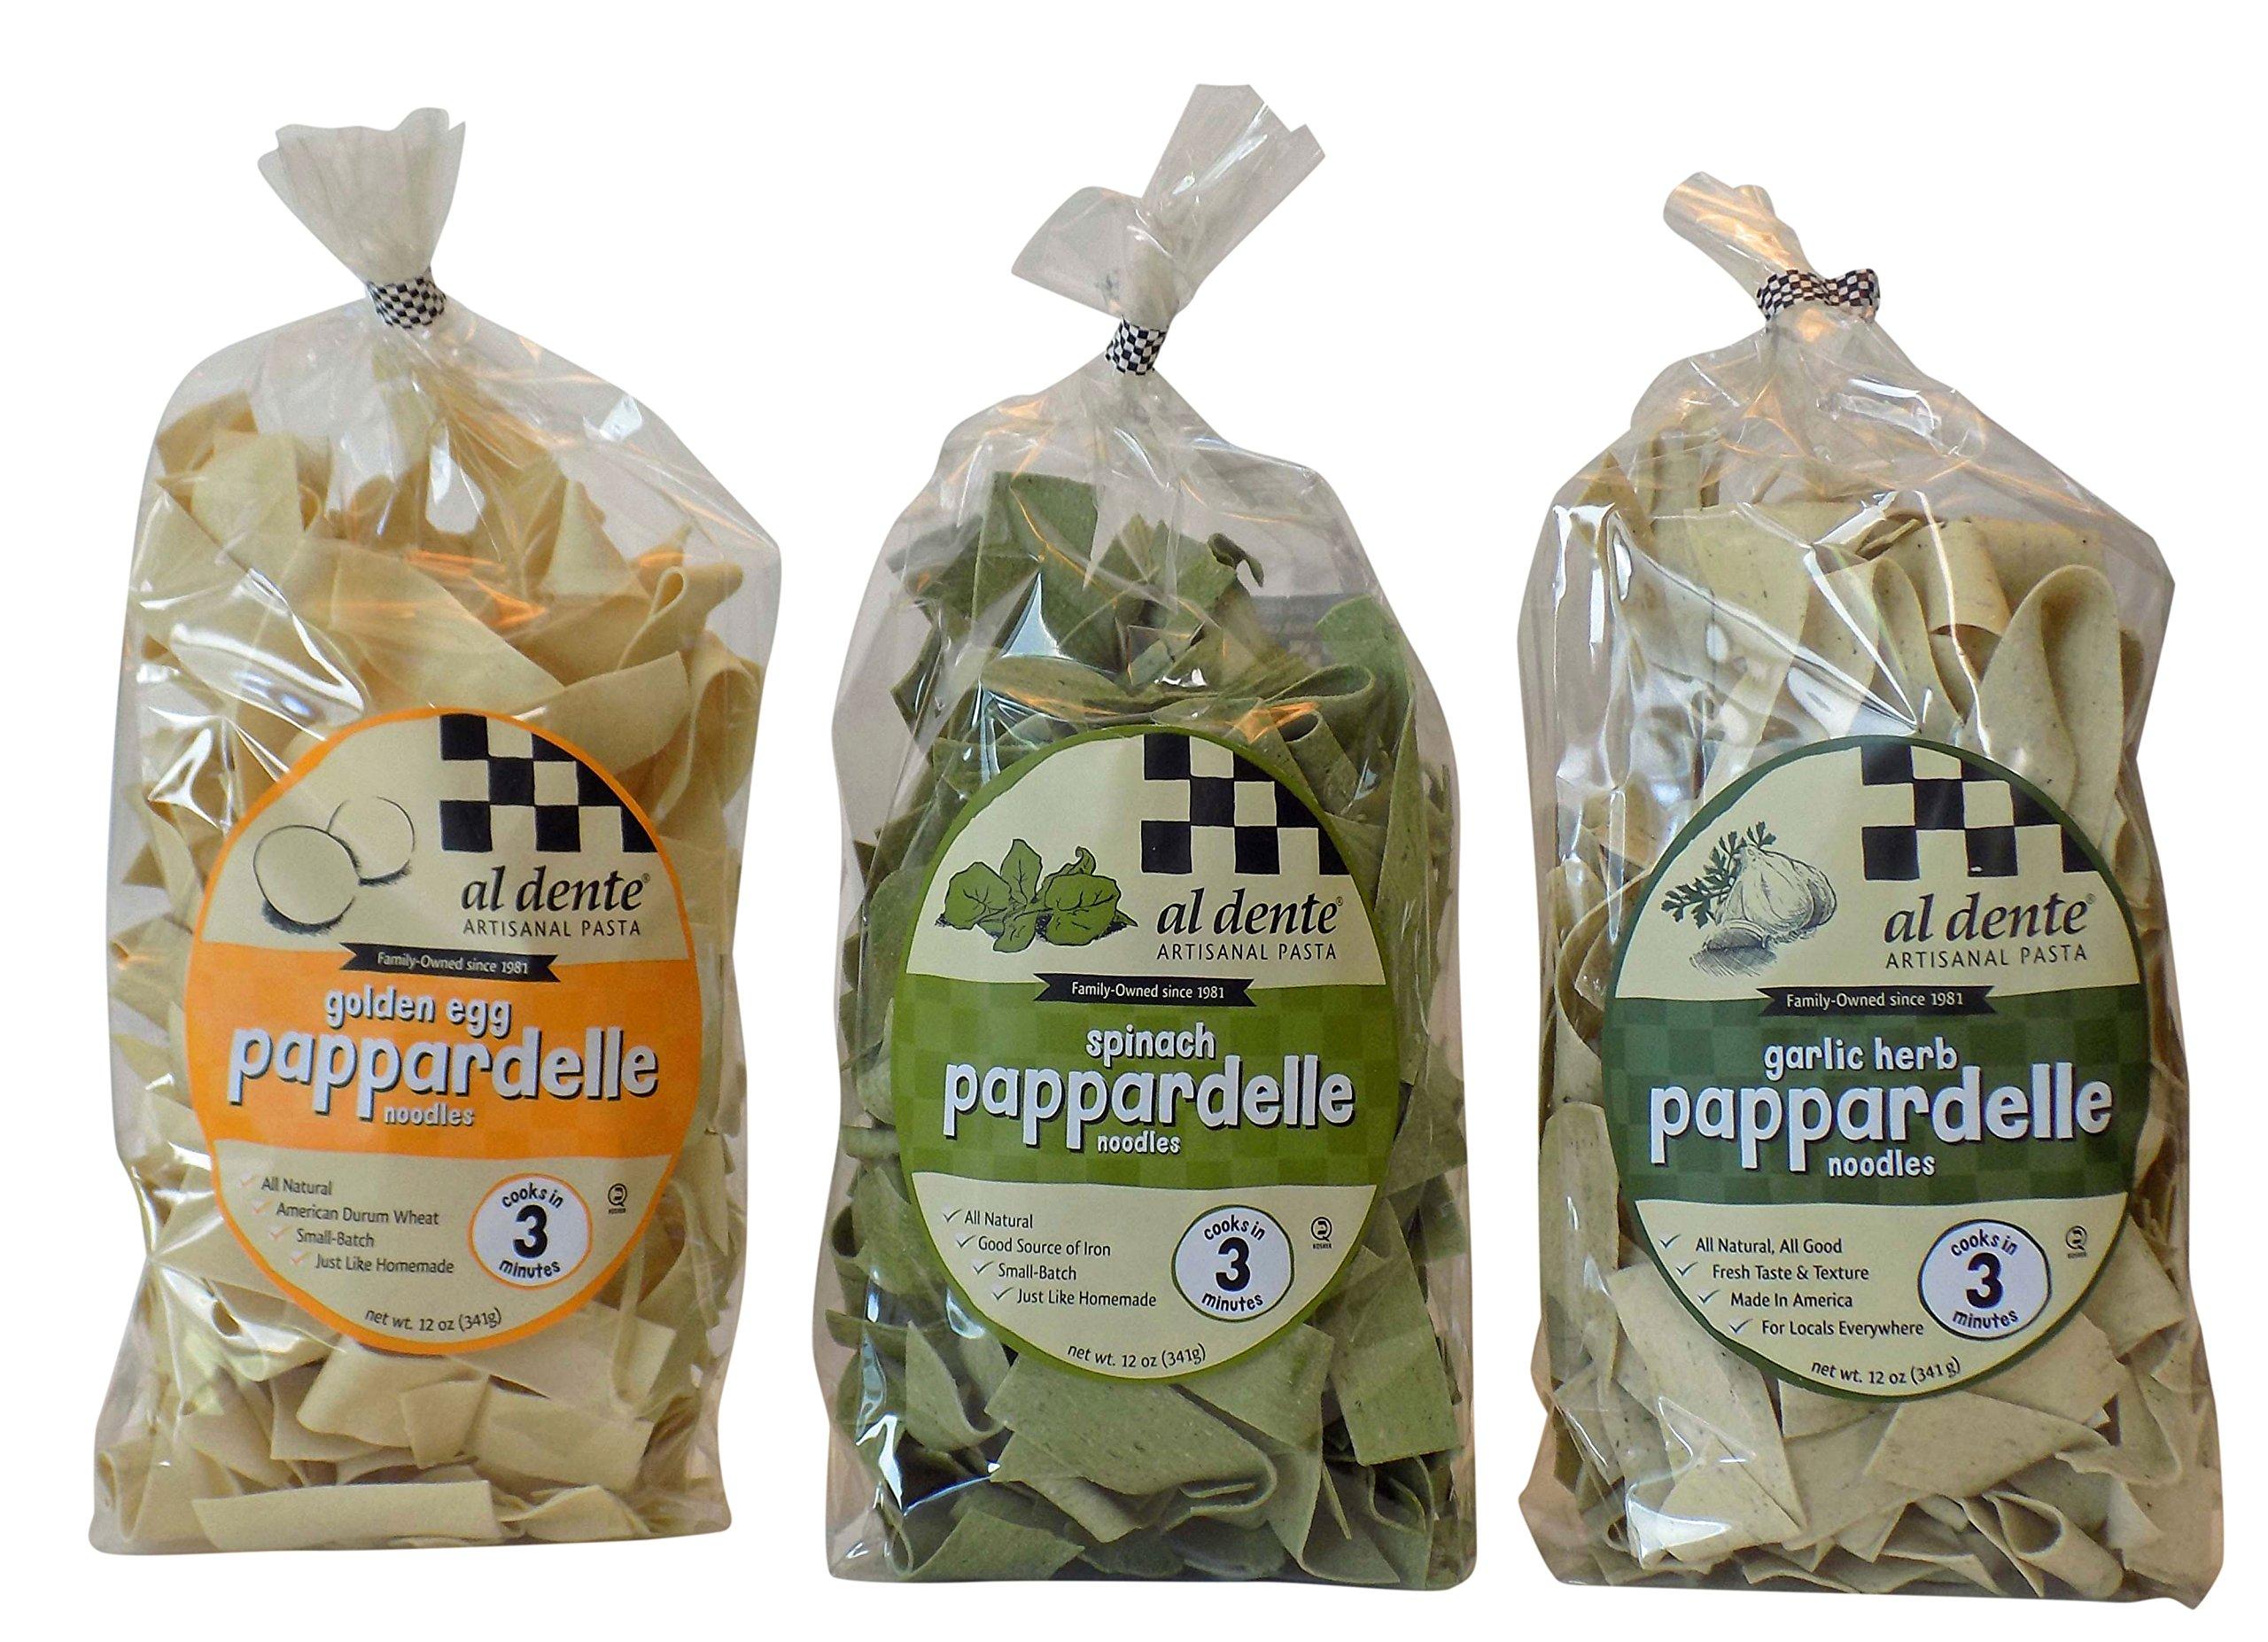 Al Dente Artisanal Pappardelle Pasta Variety Sampler - Golden Egg, Spinach, Garlic Herb (Pack of 3)